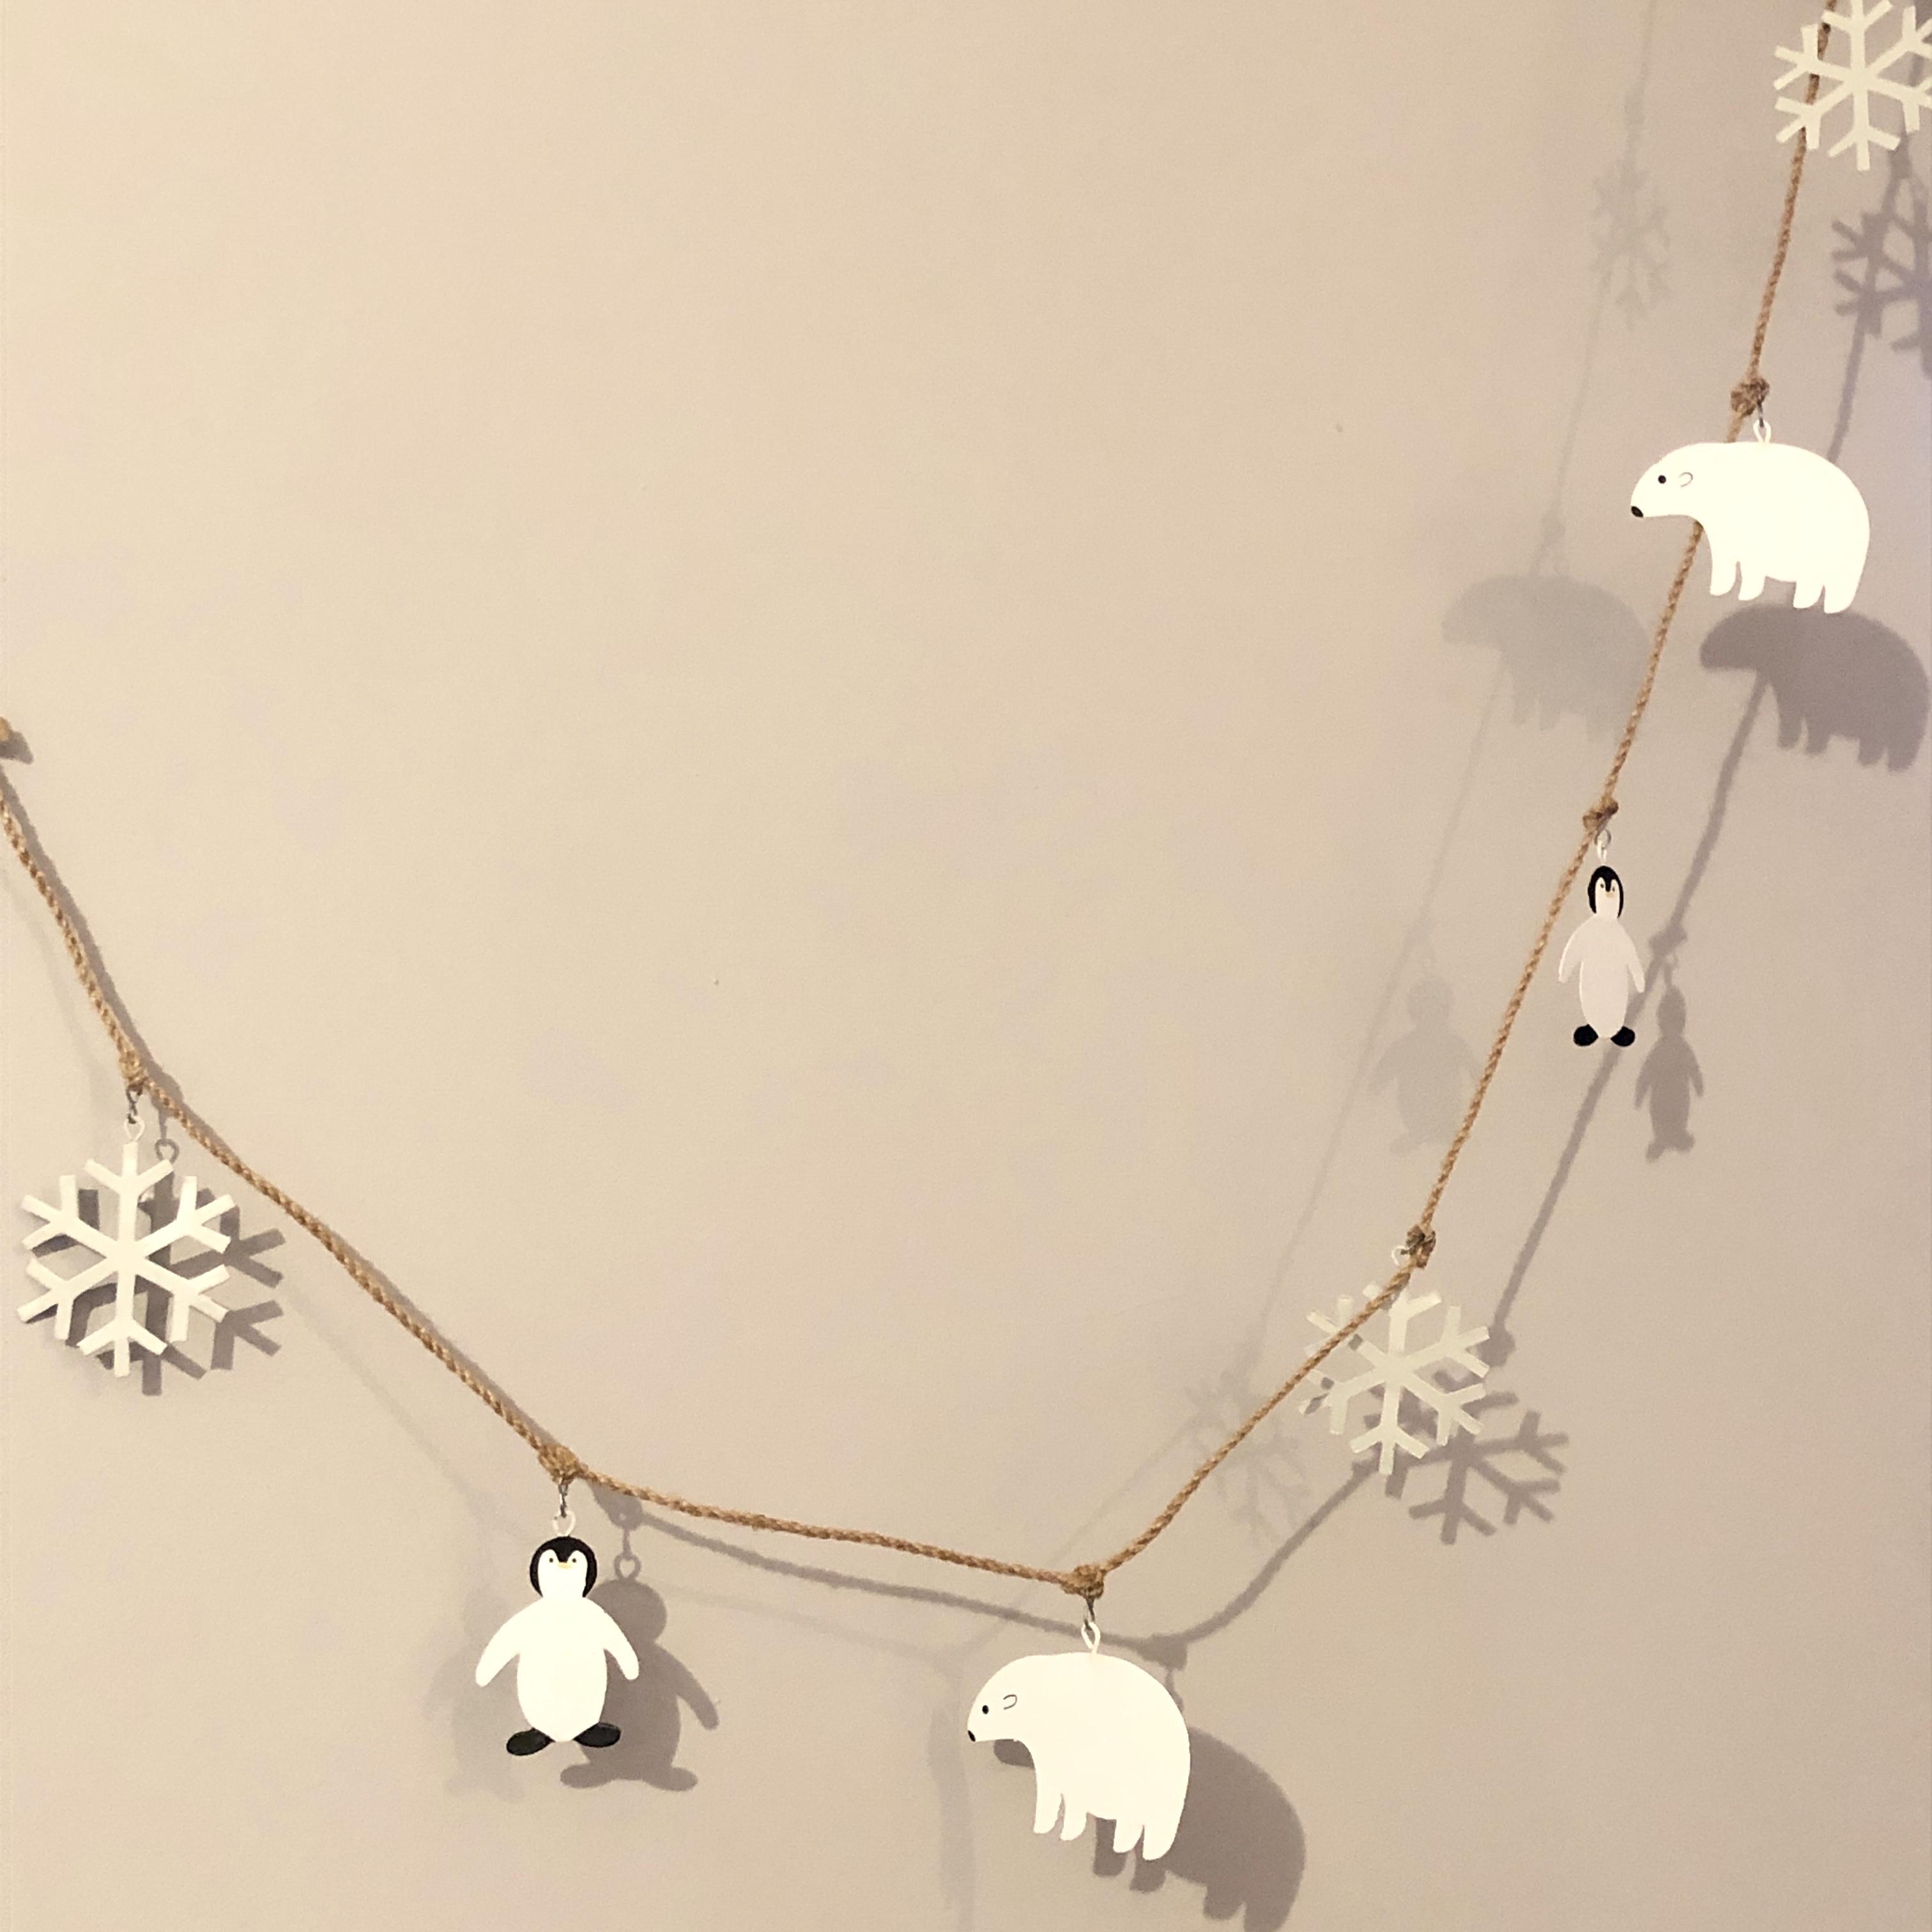 Polar bear and penguin garland, Christmas decoration by shoeless joe